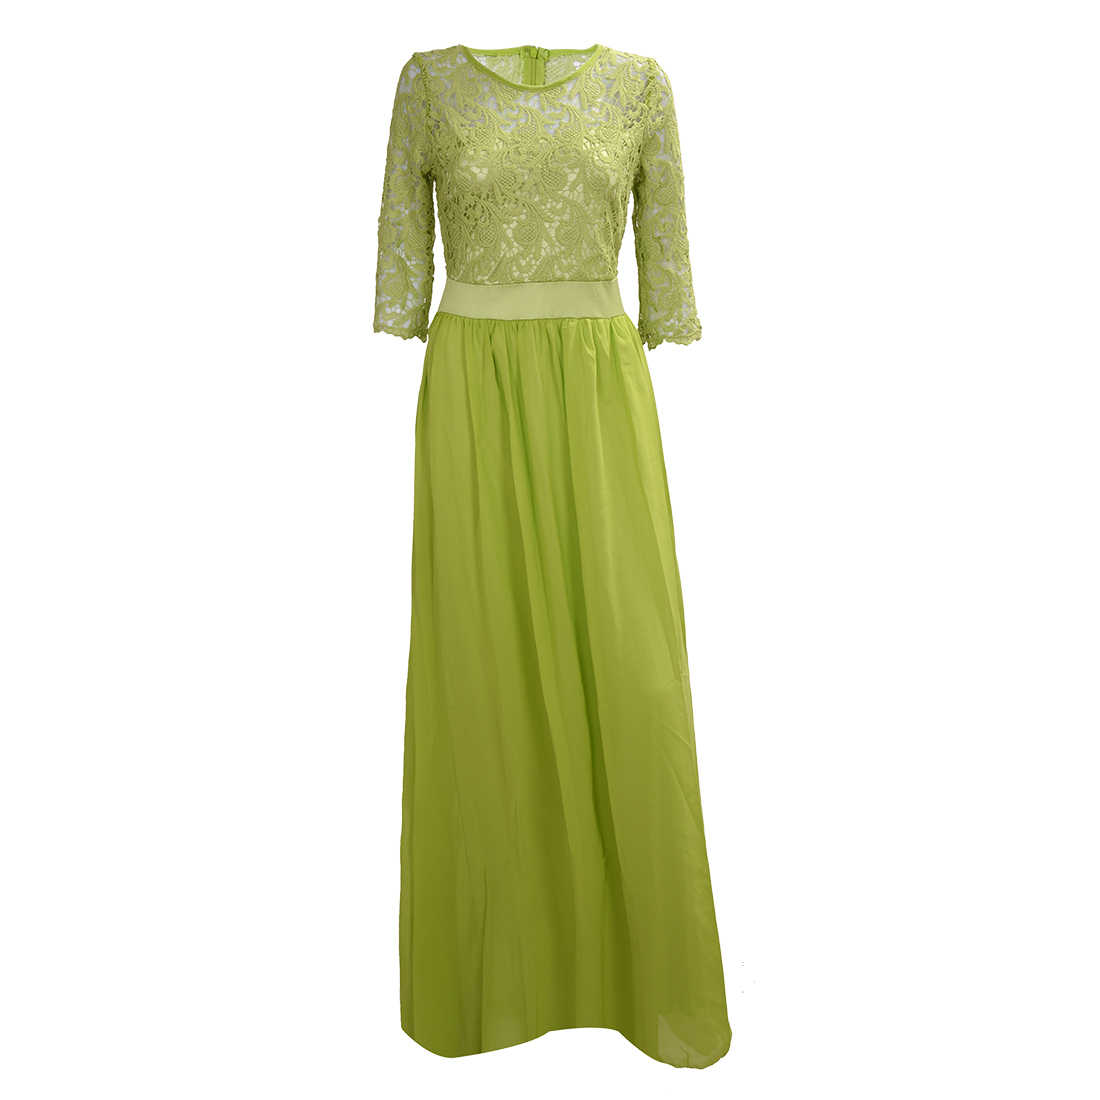 ... TFGS 2016 Plus Size Women Wedding Party Long Dress Mid-Sleeve Chiffon  Lace Dresses Maxi ... e568faf380bc